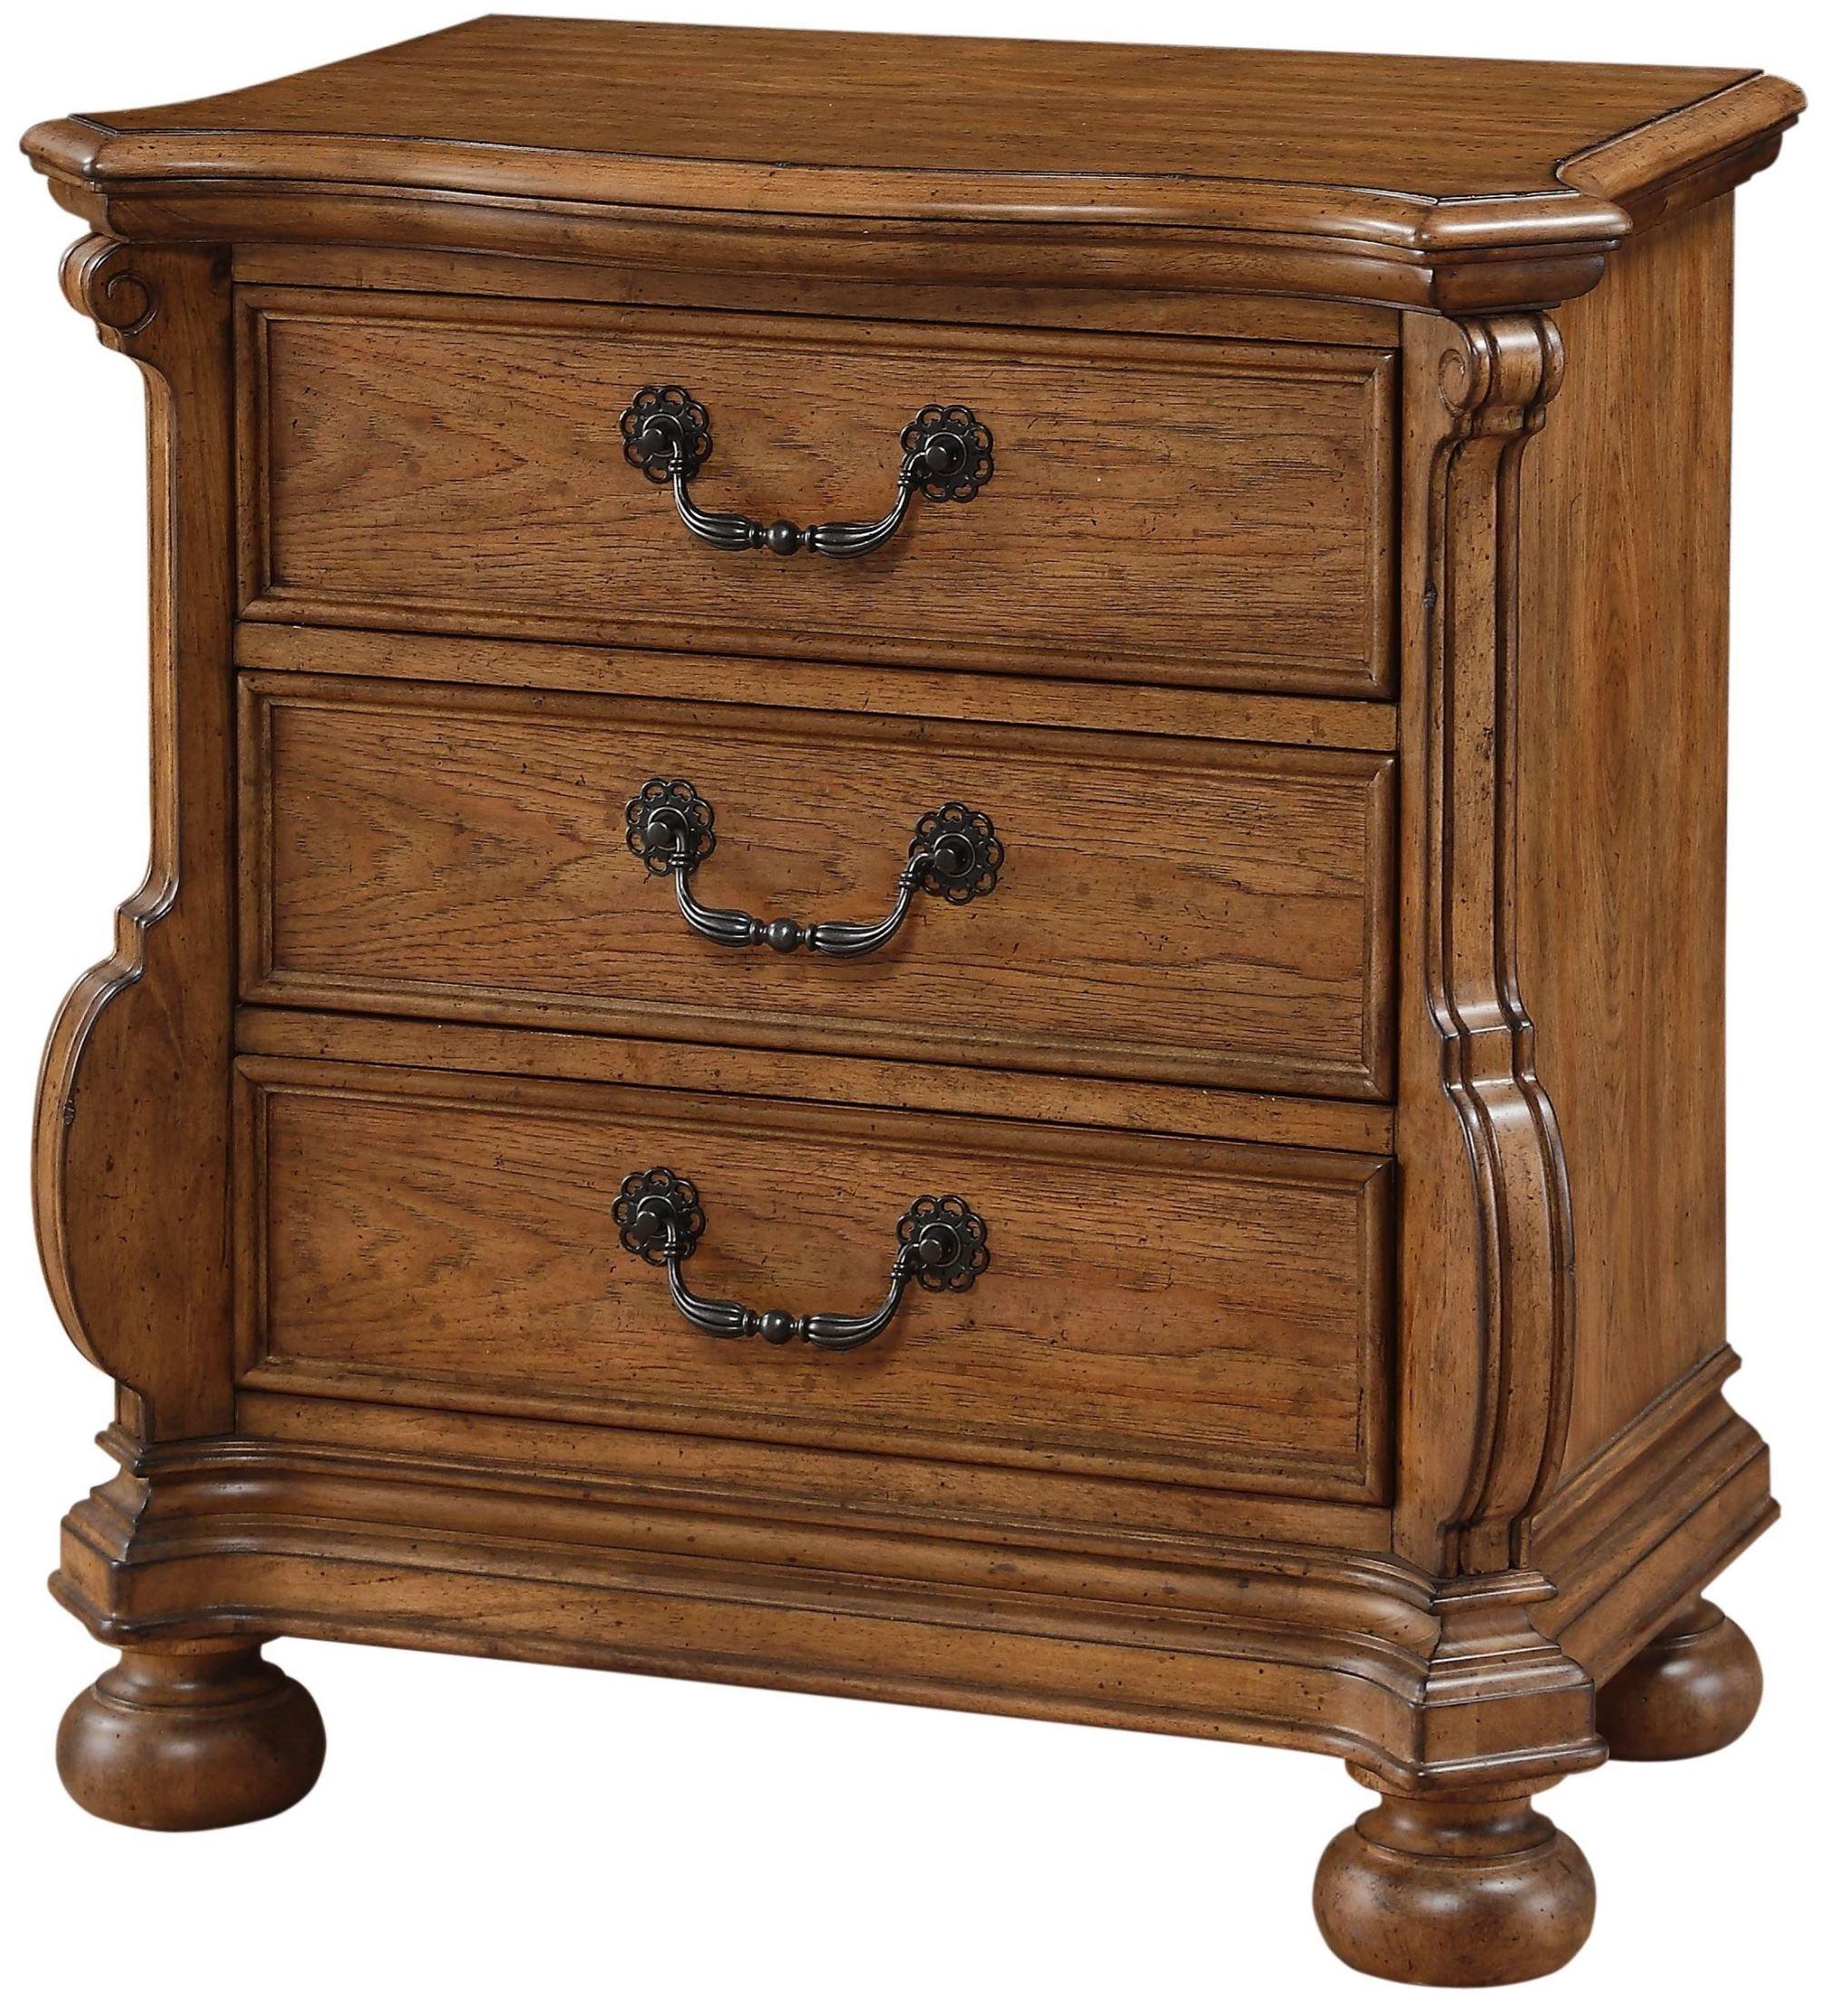 Belle Meade Sunkissed Pecan Panel Bedroom Set 8900 950 952 880 American Woodcrafters